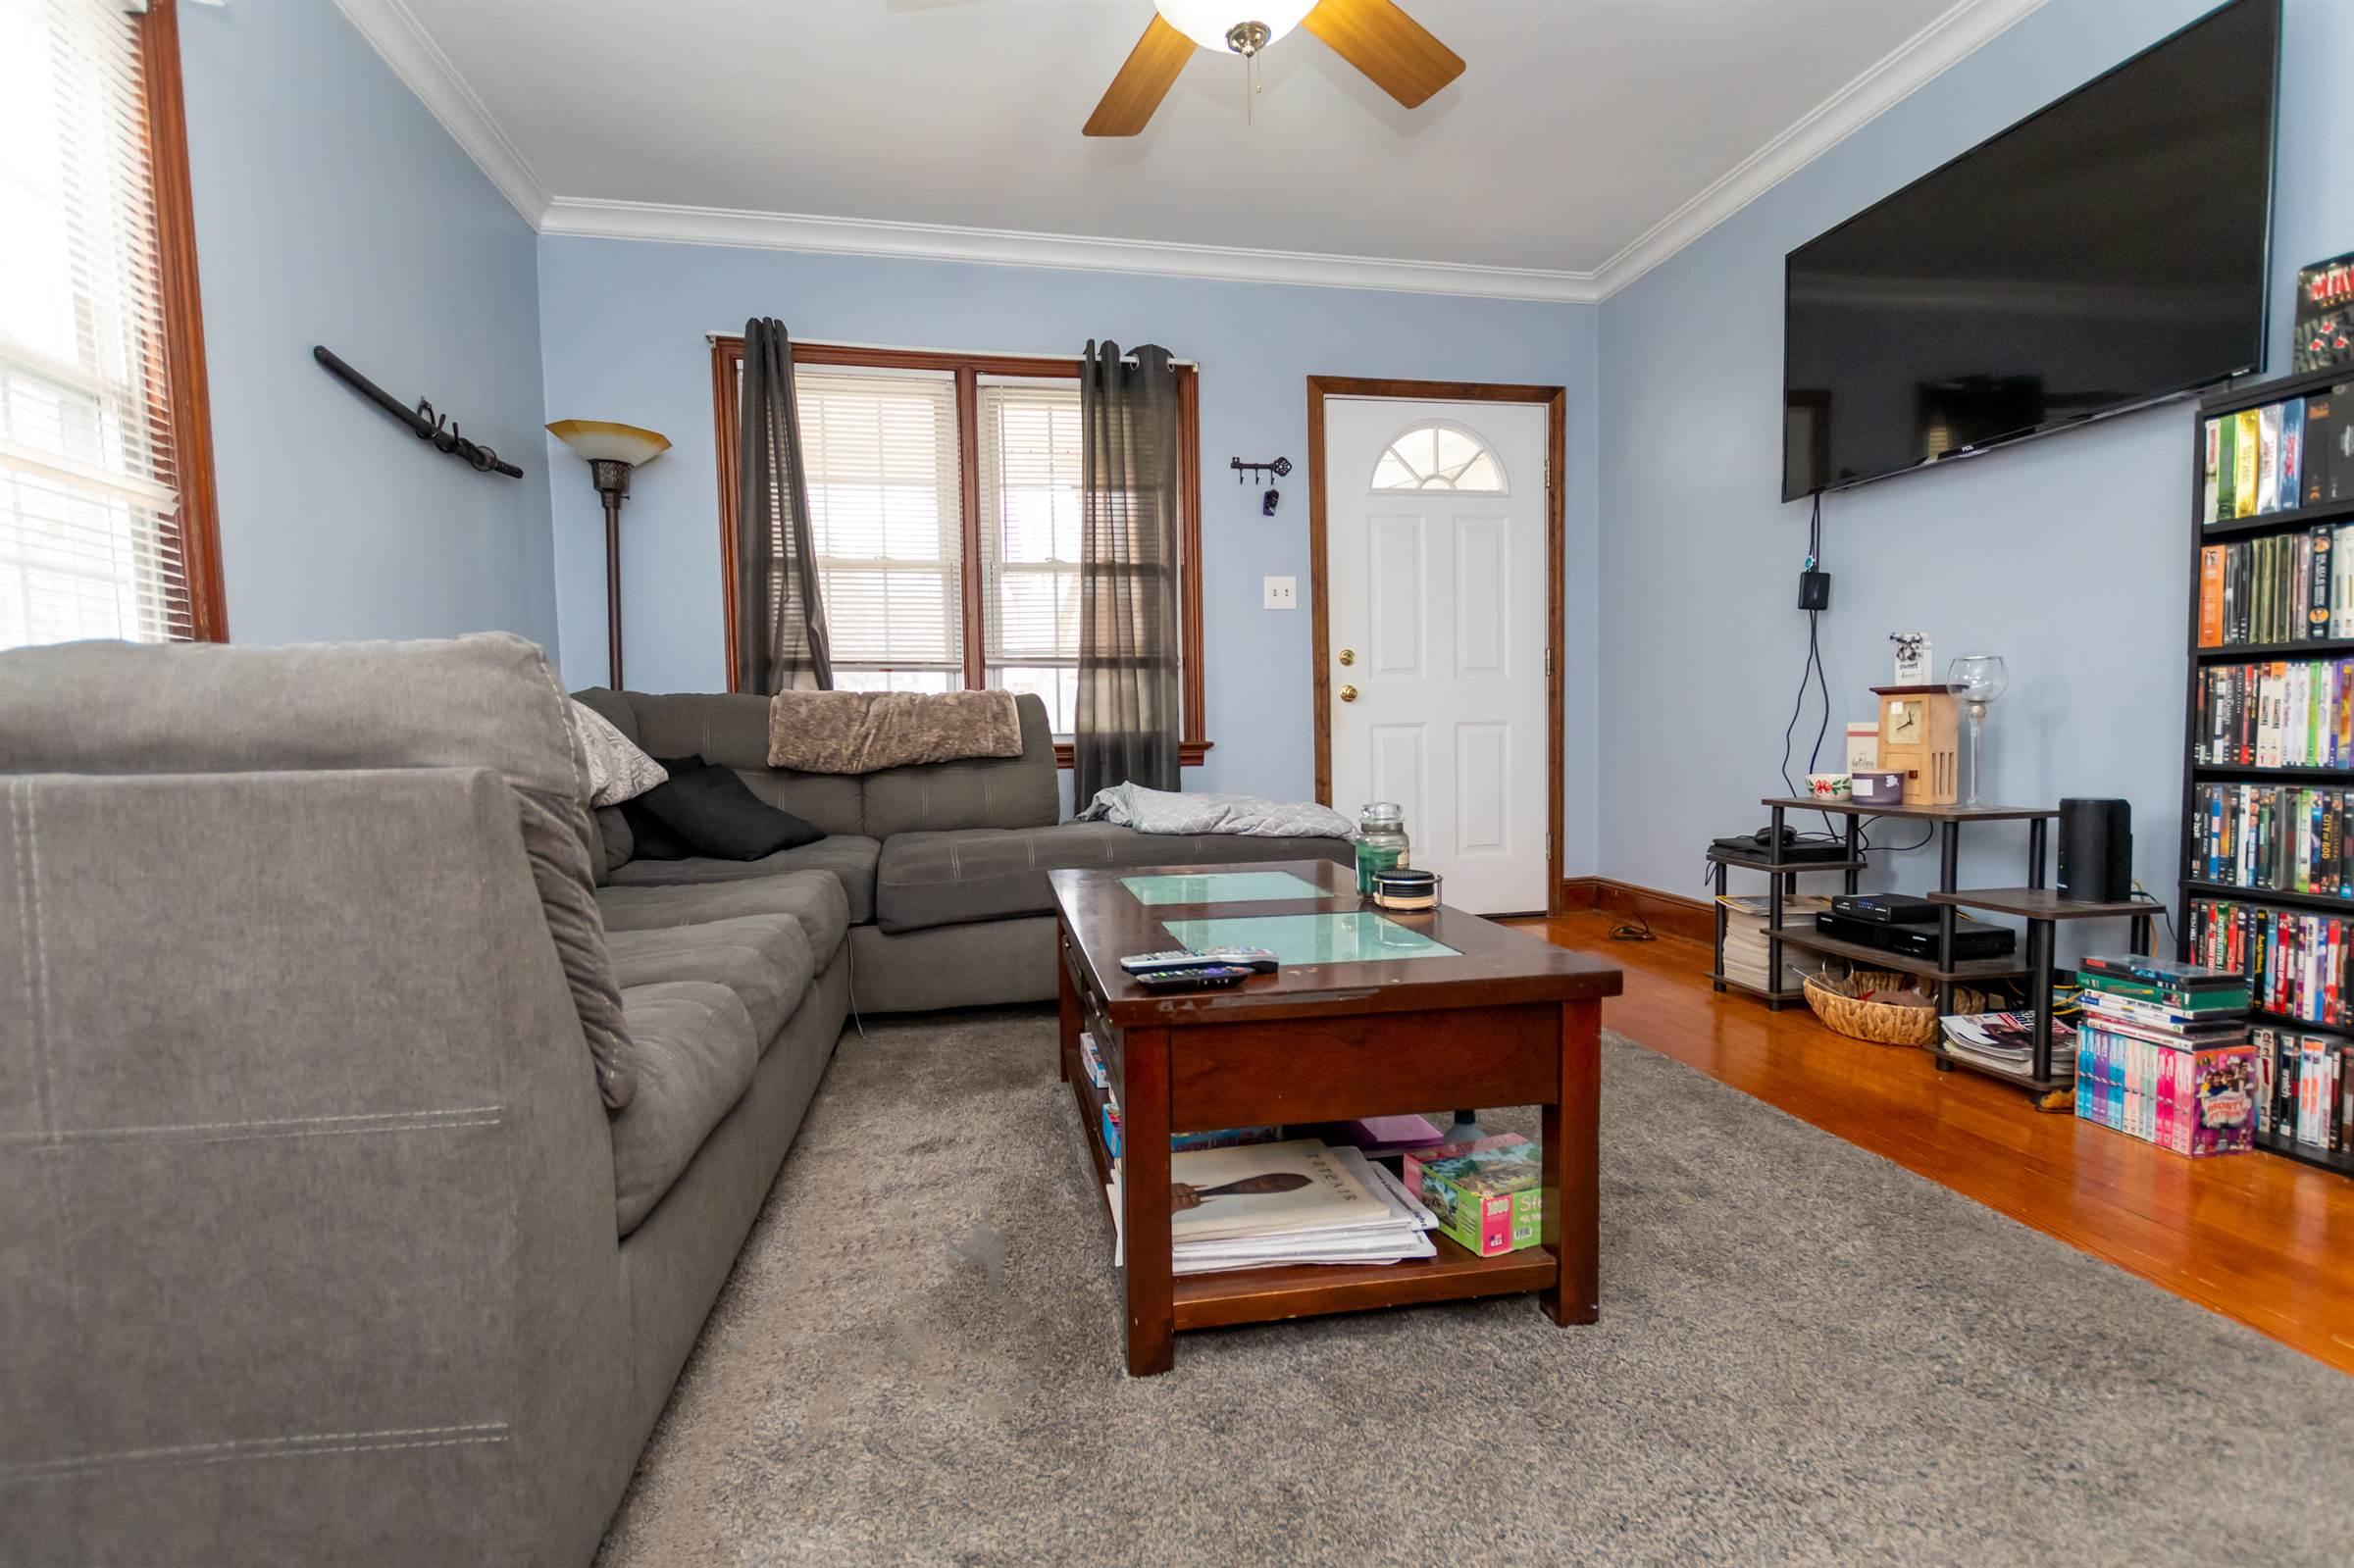 405 Fulton St, Middlesex, NJ 08846